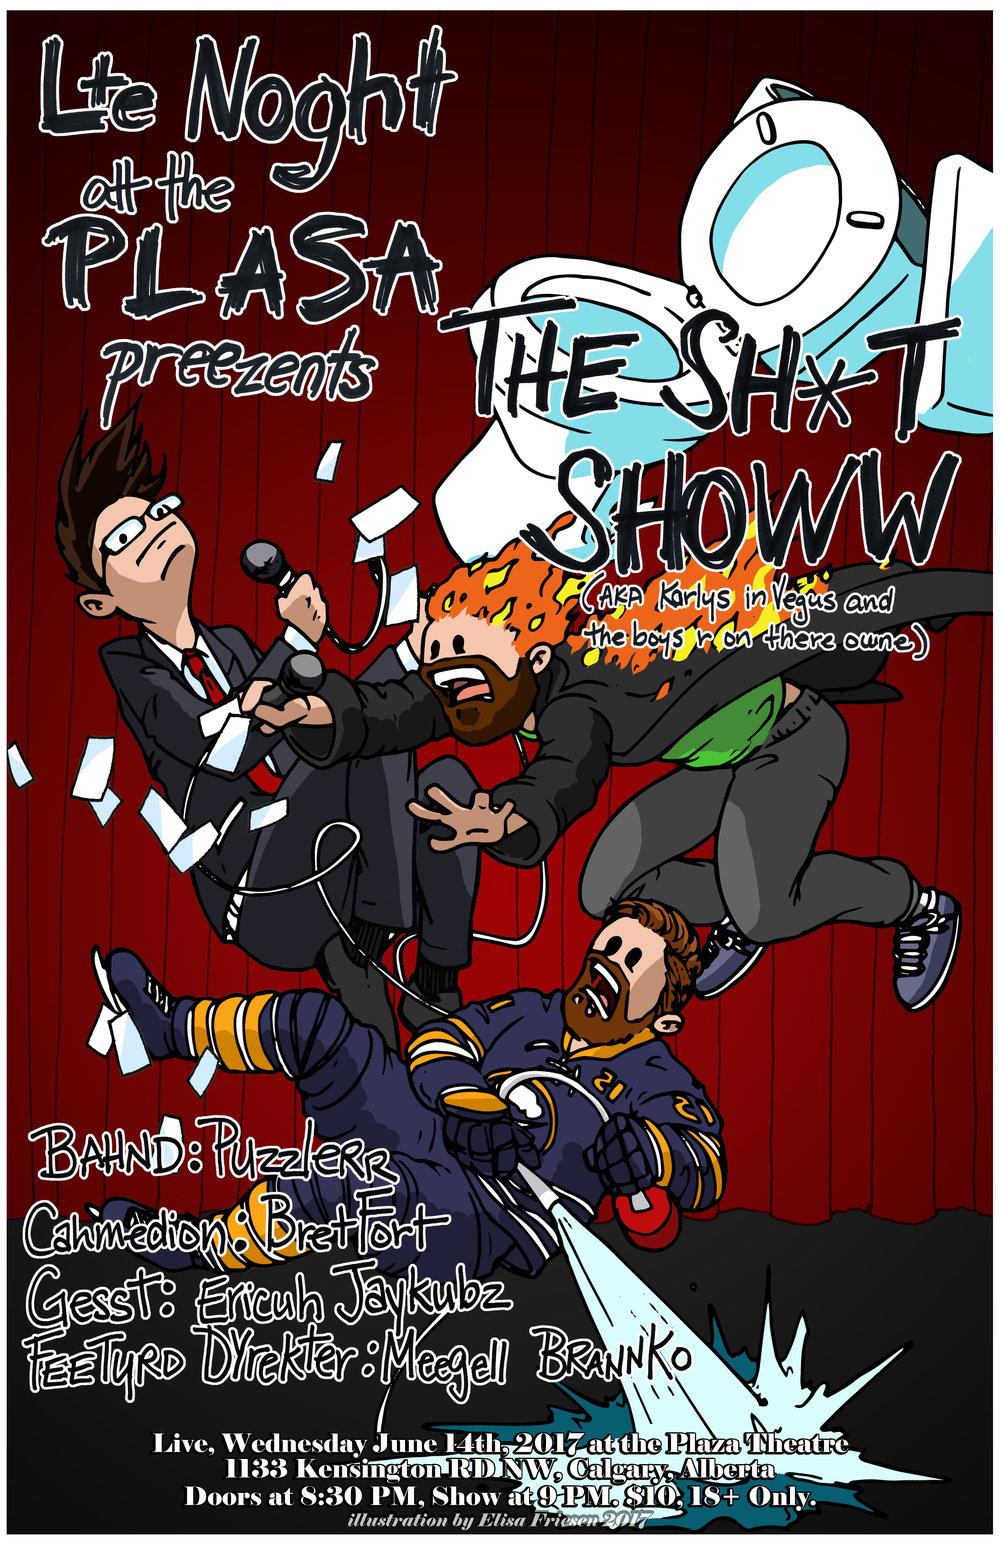 The-Shit-Show-11-x-17.jpg